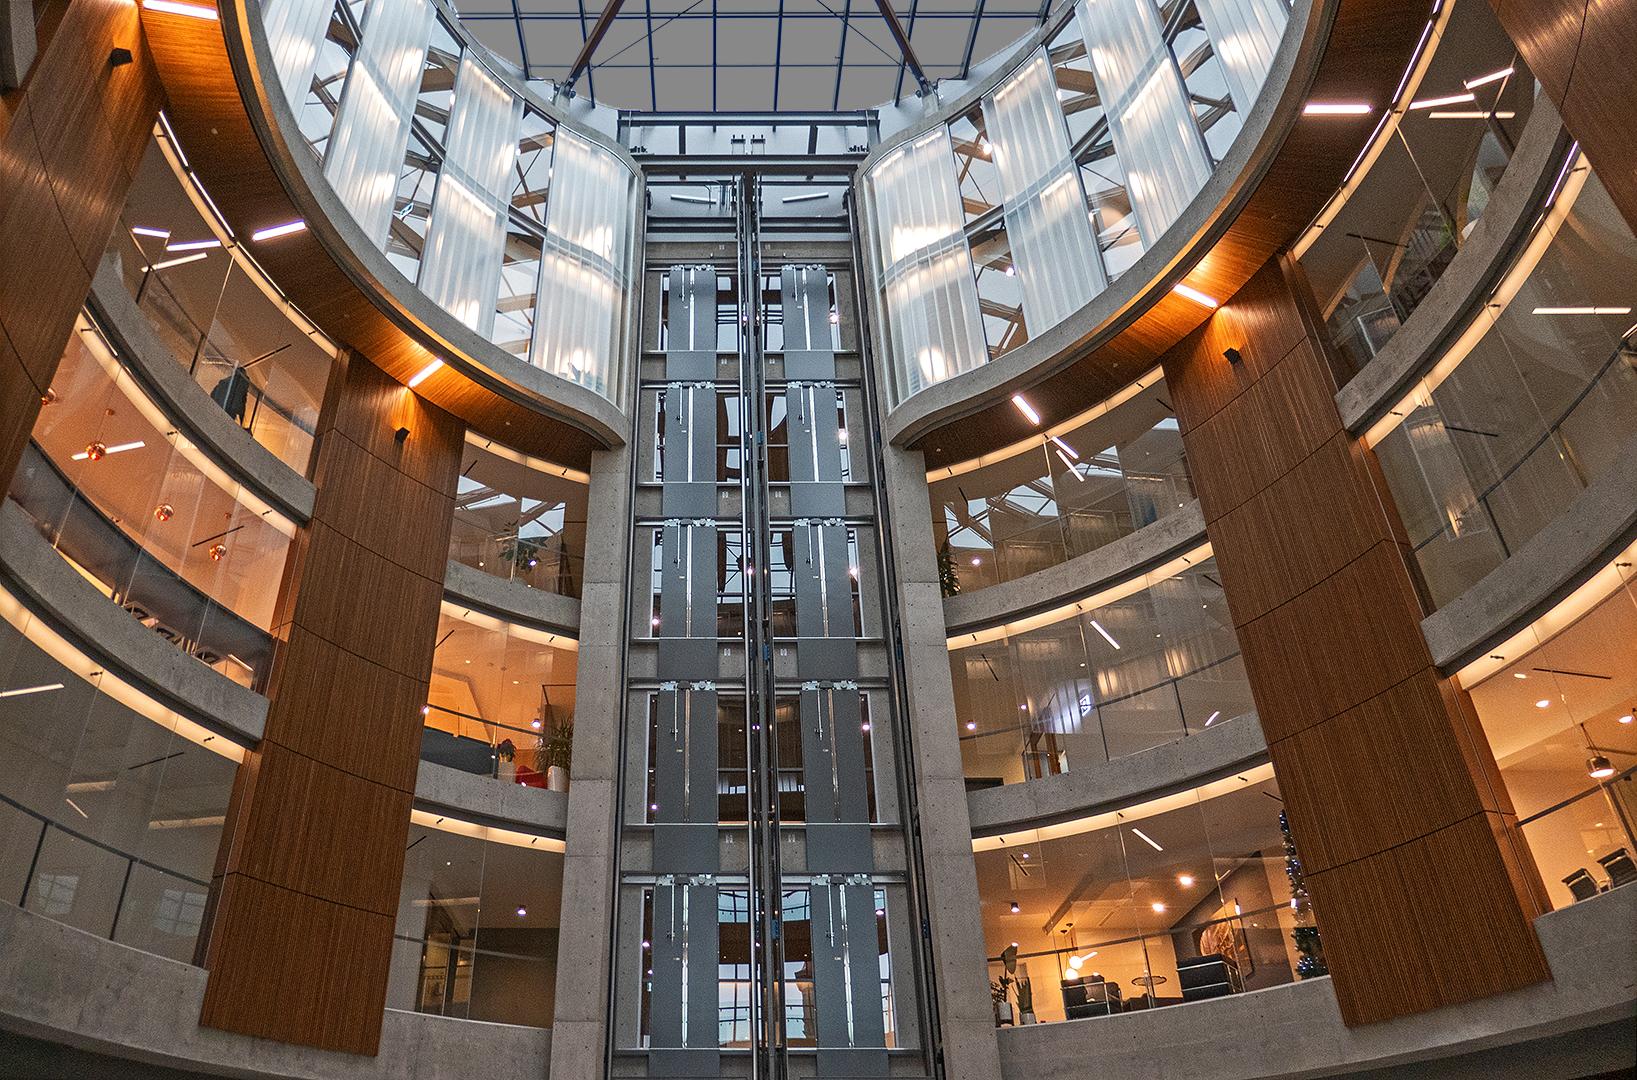 Barbara Kell – Elevator in Rotunda – HM